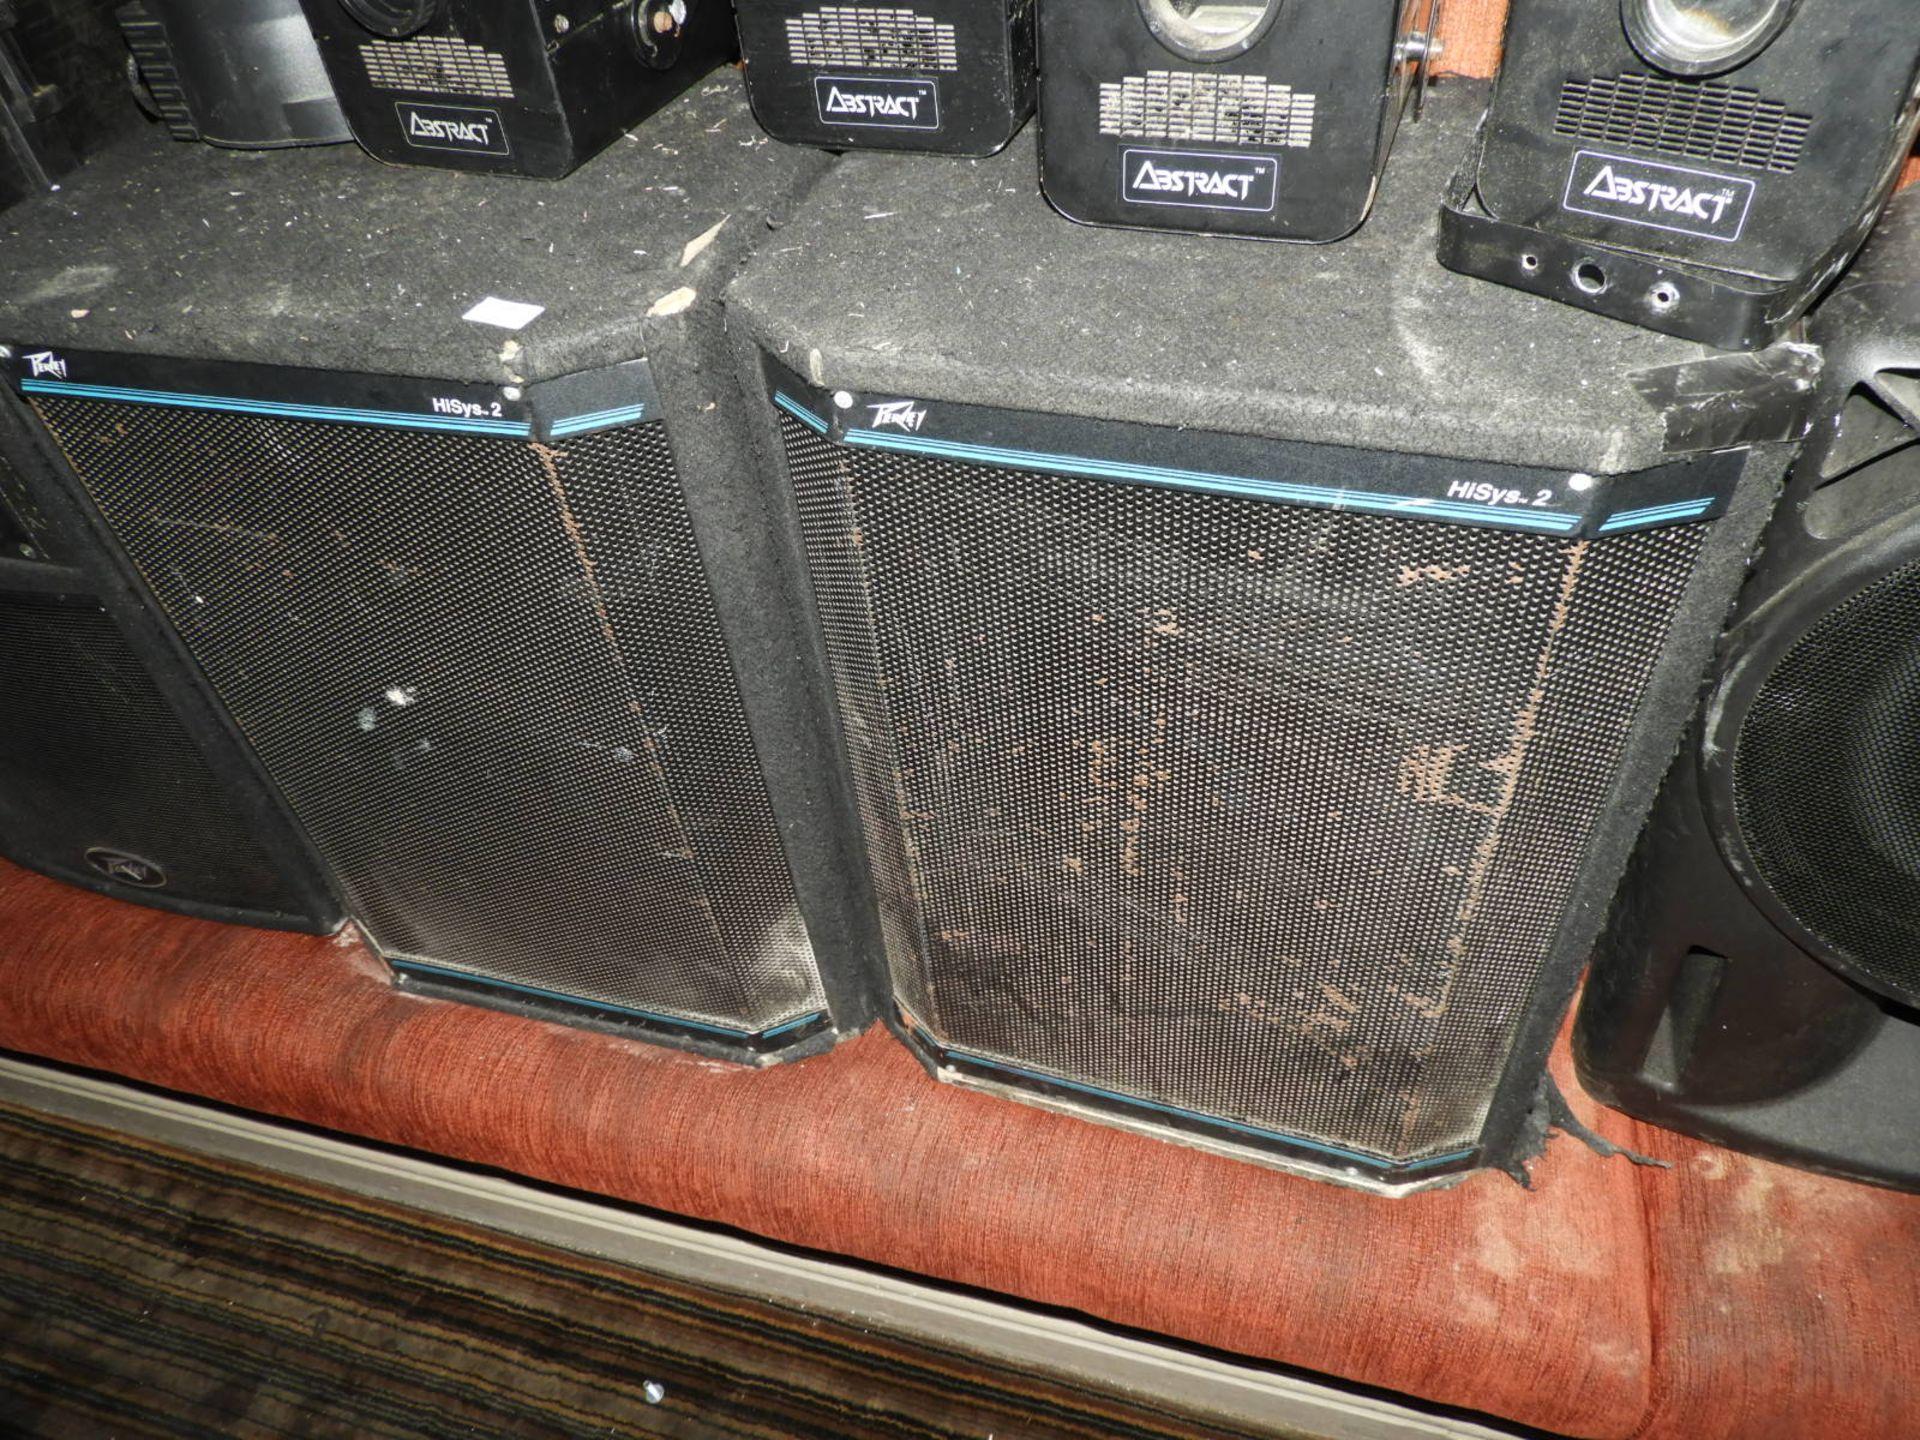 Lot 66 - *Pair of Peavey Hisys 2 Speakers